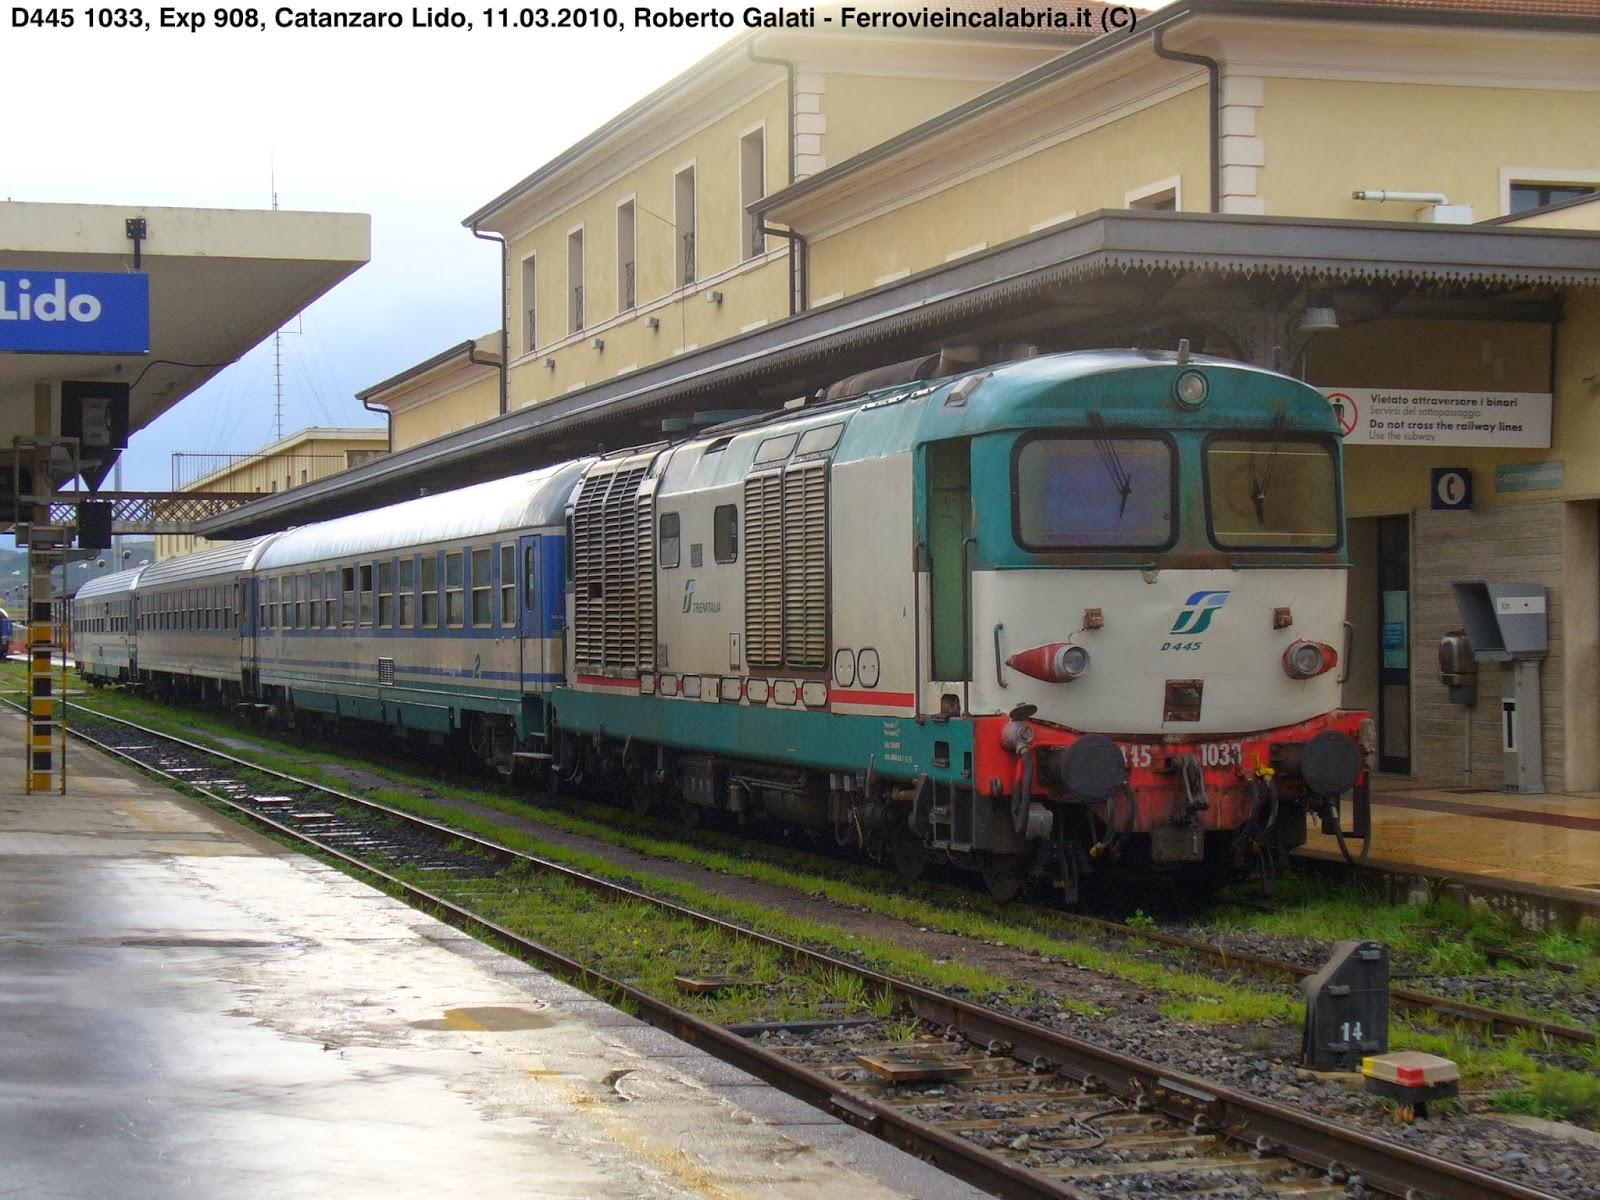 D445 1033-Exp908 CzLidoCrotoneBariTorinoPN-CatanzaroLido-2010-03-11-RobertoGalati